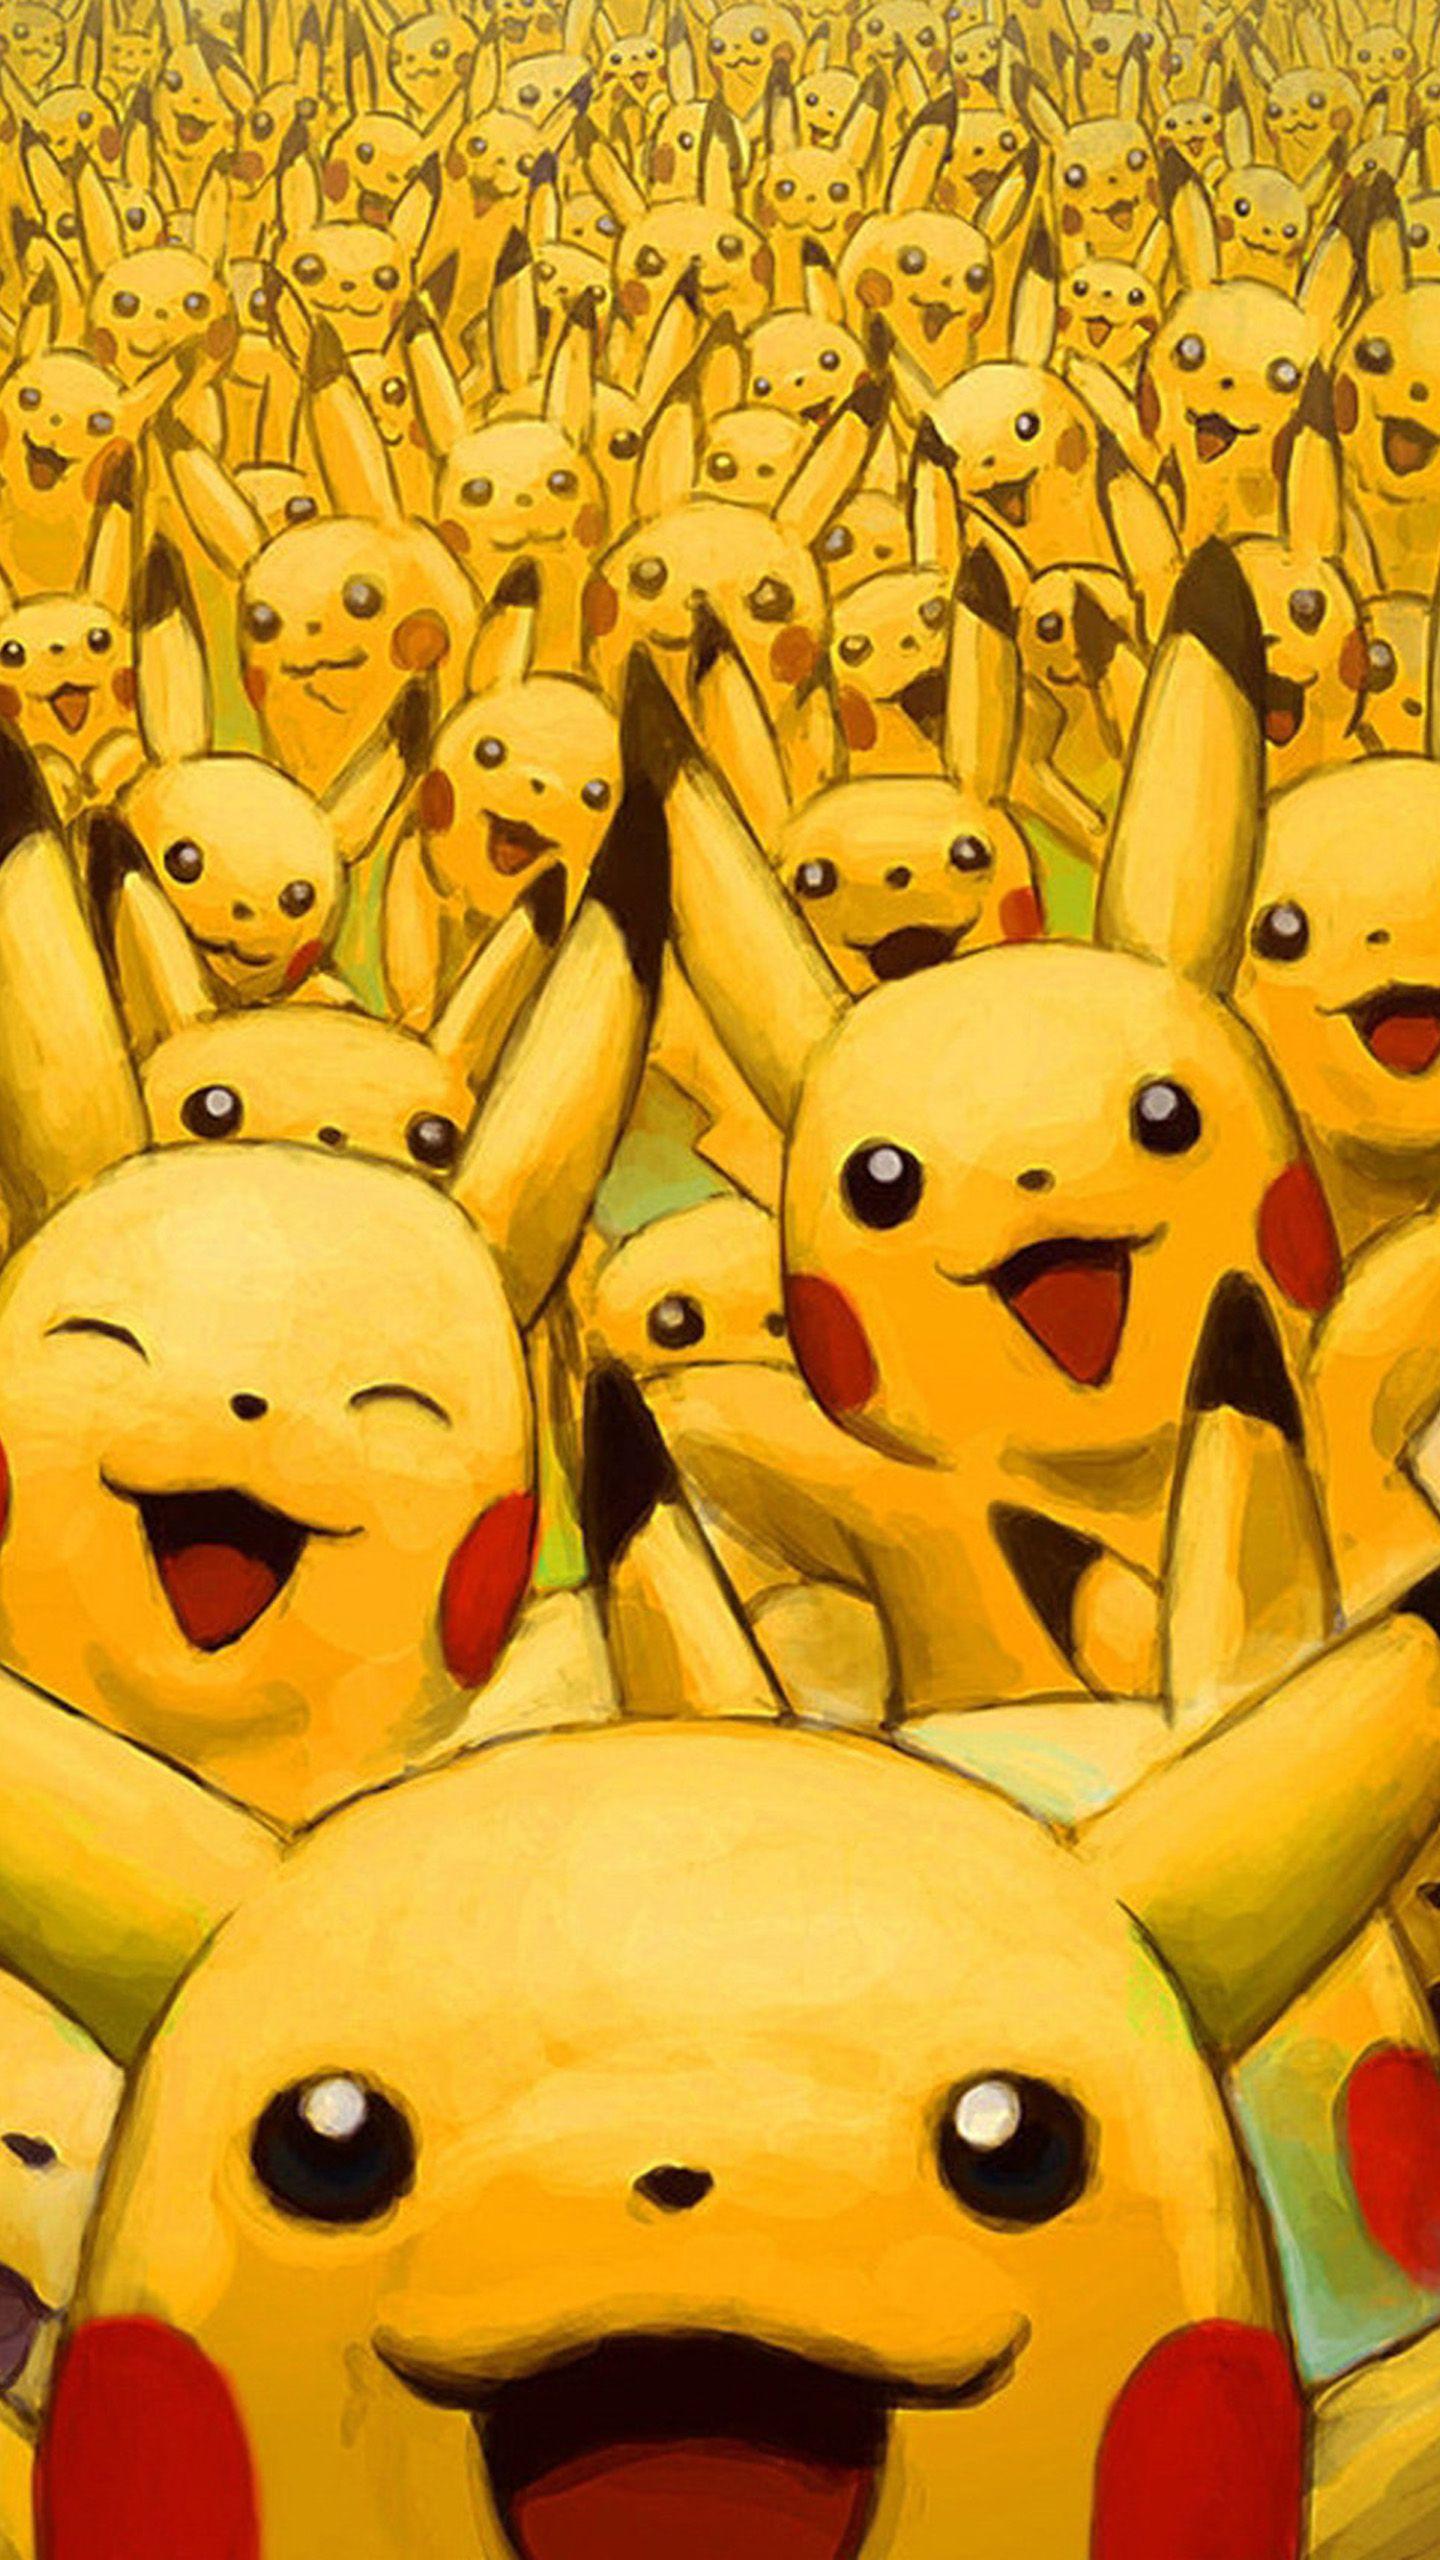 Wild pikachus Note 4 Wallpapers Pikachu wallpaper